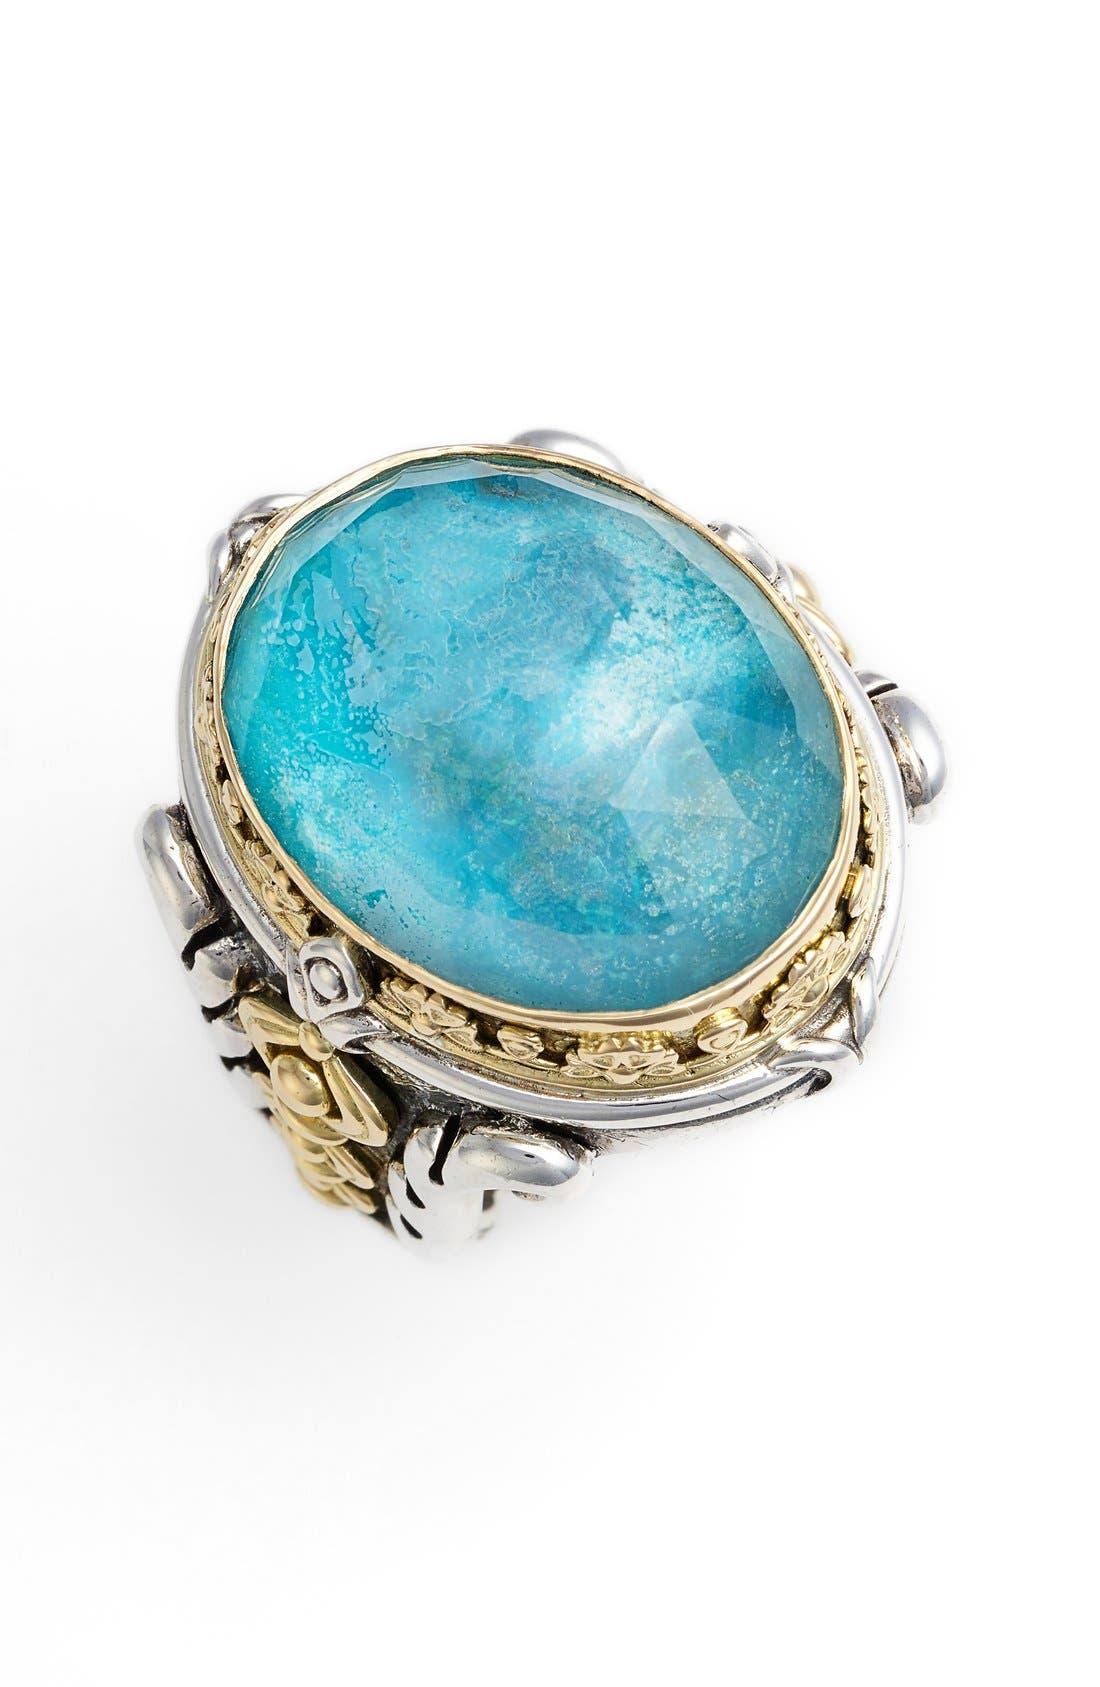 Main Image - Konstantino 'Iliada' Large Oval Semiprecious Stone Ring